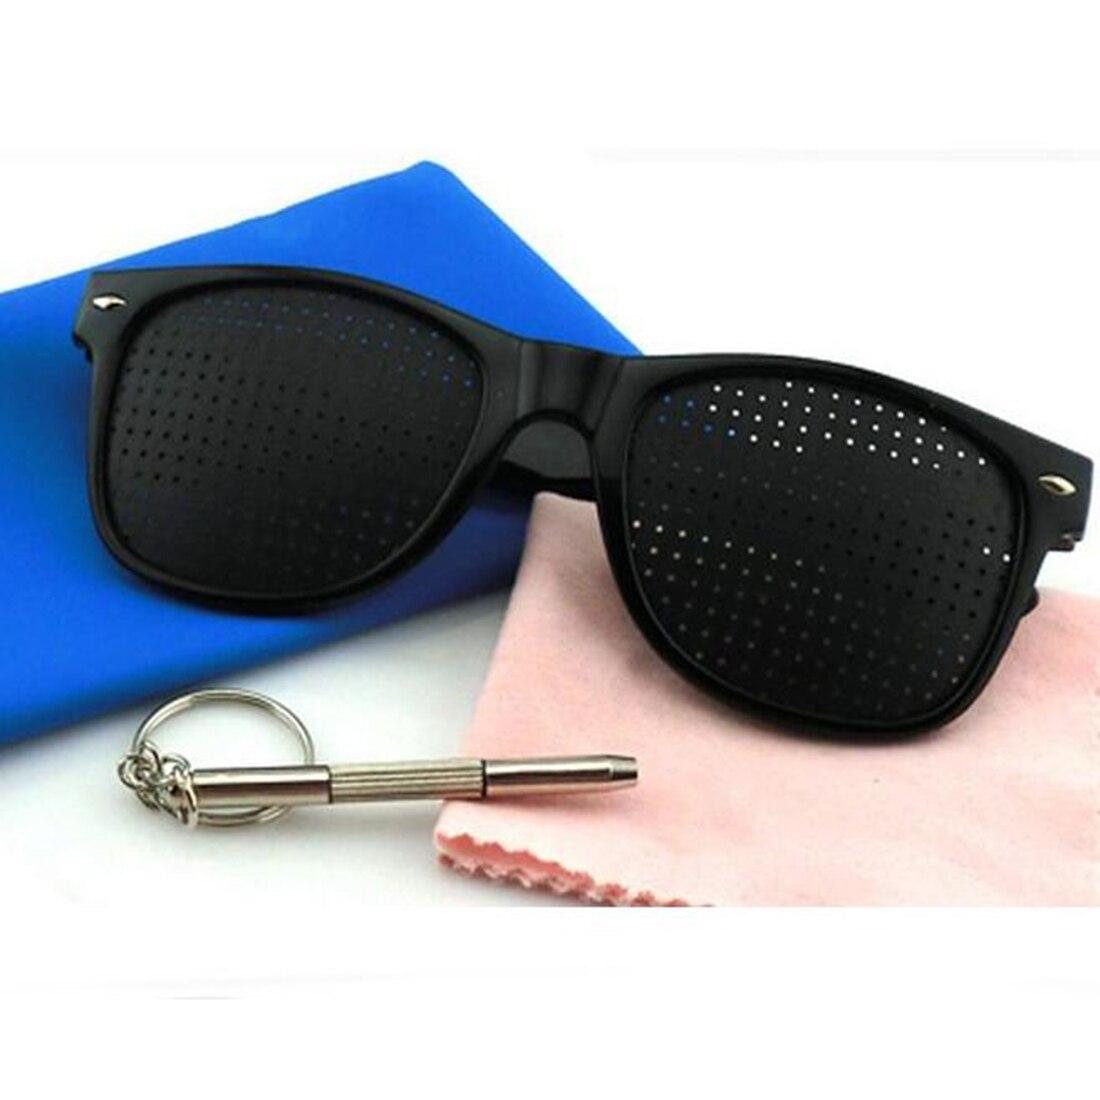 Men Women Anti-myopia Eye Exercise Improver Glasses Eyesight Natural Stenopeic Glasses Vision Care Pin Hole Sunglasses